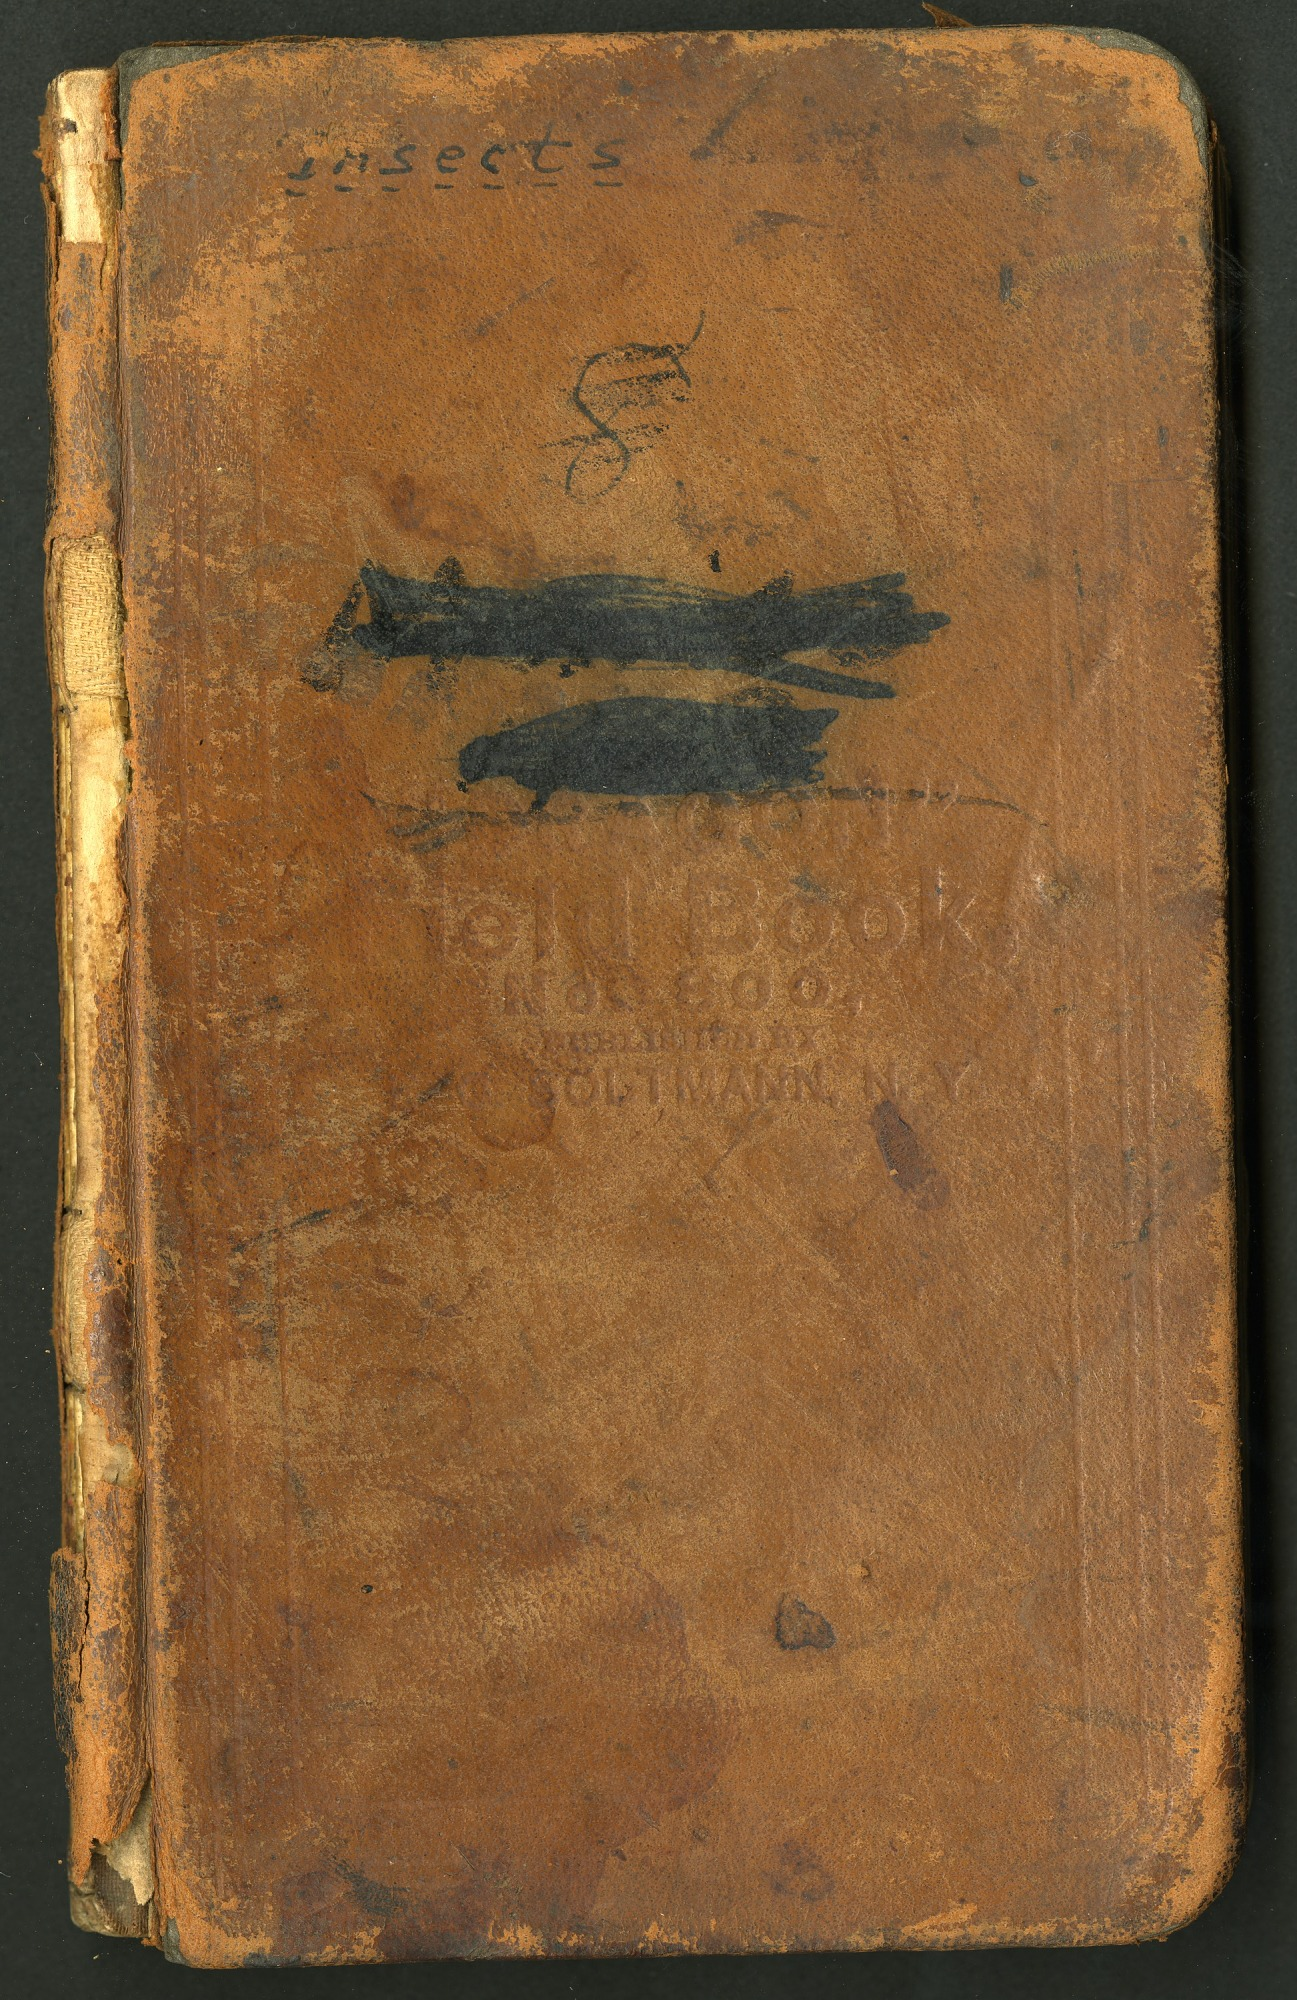 Field notes by William M. Mann, Fiji and British Solomon Islands, 1915-1916